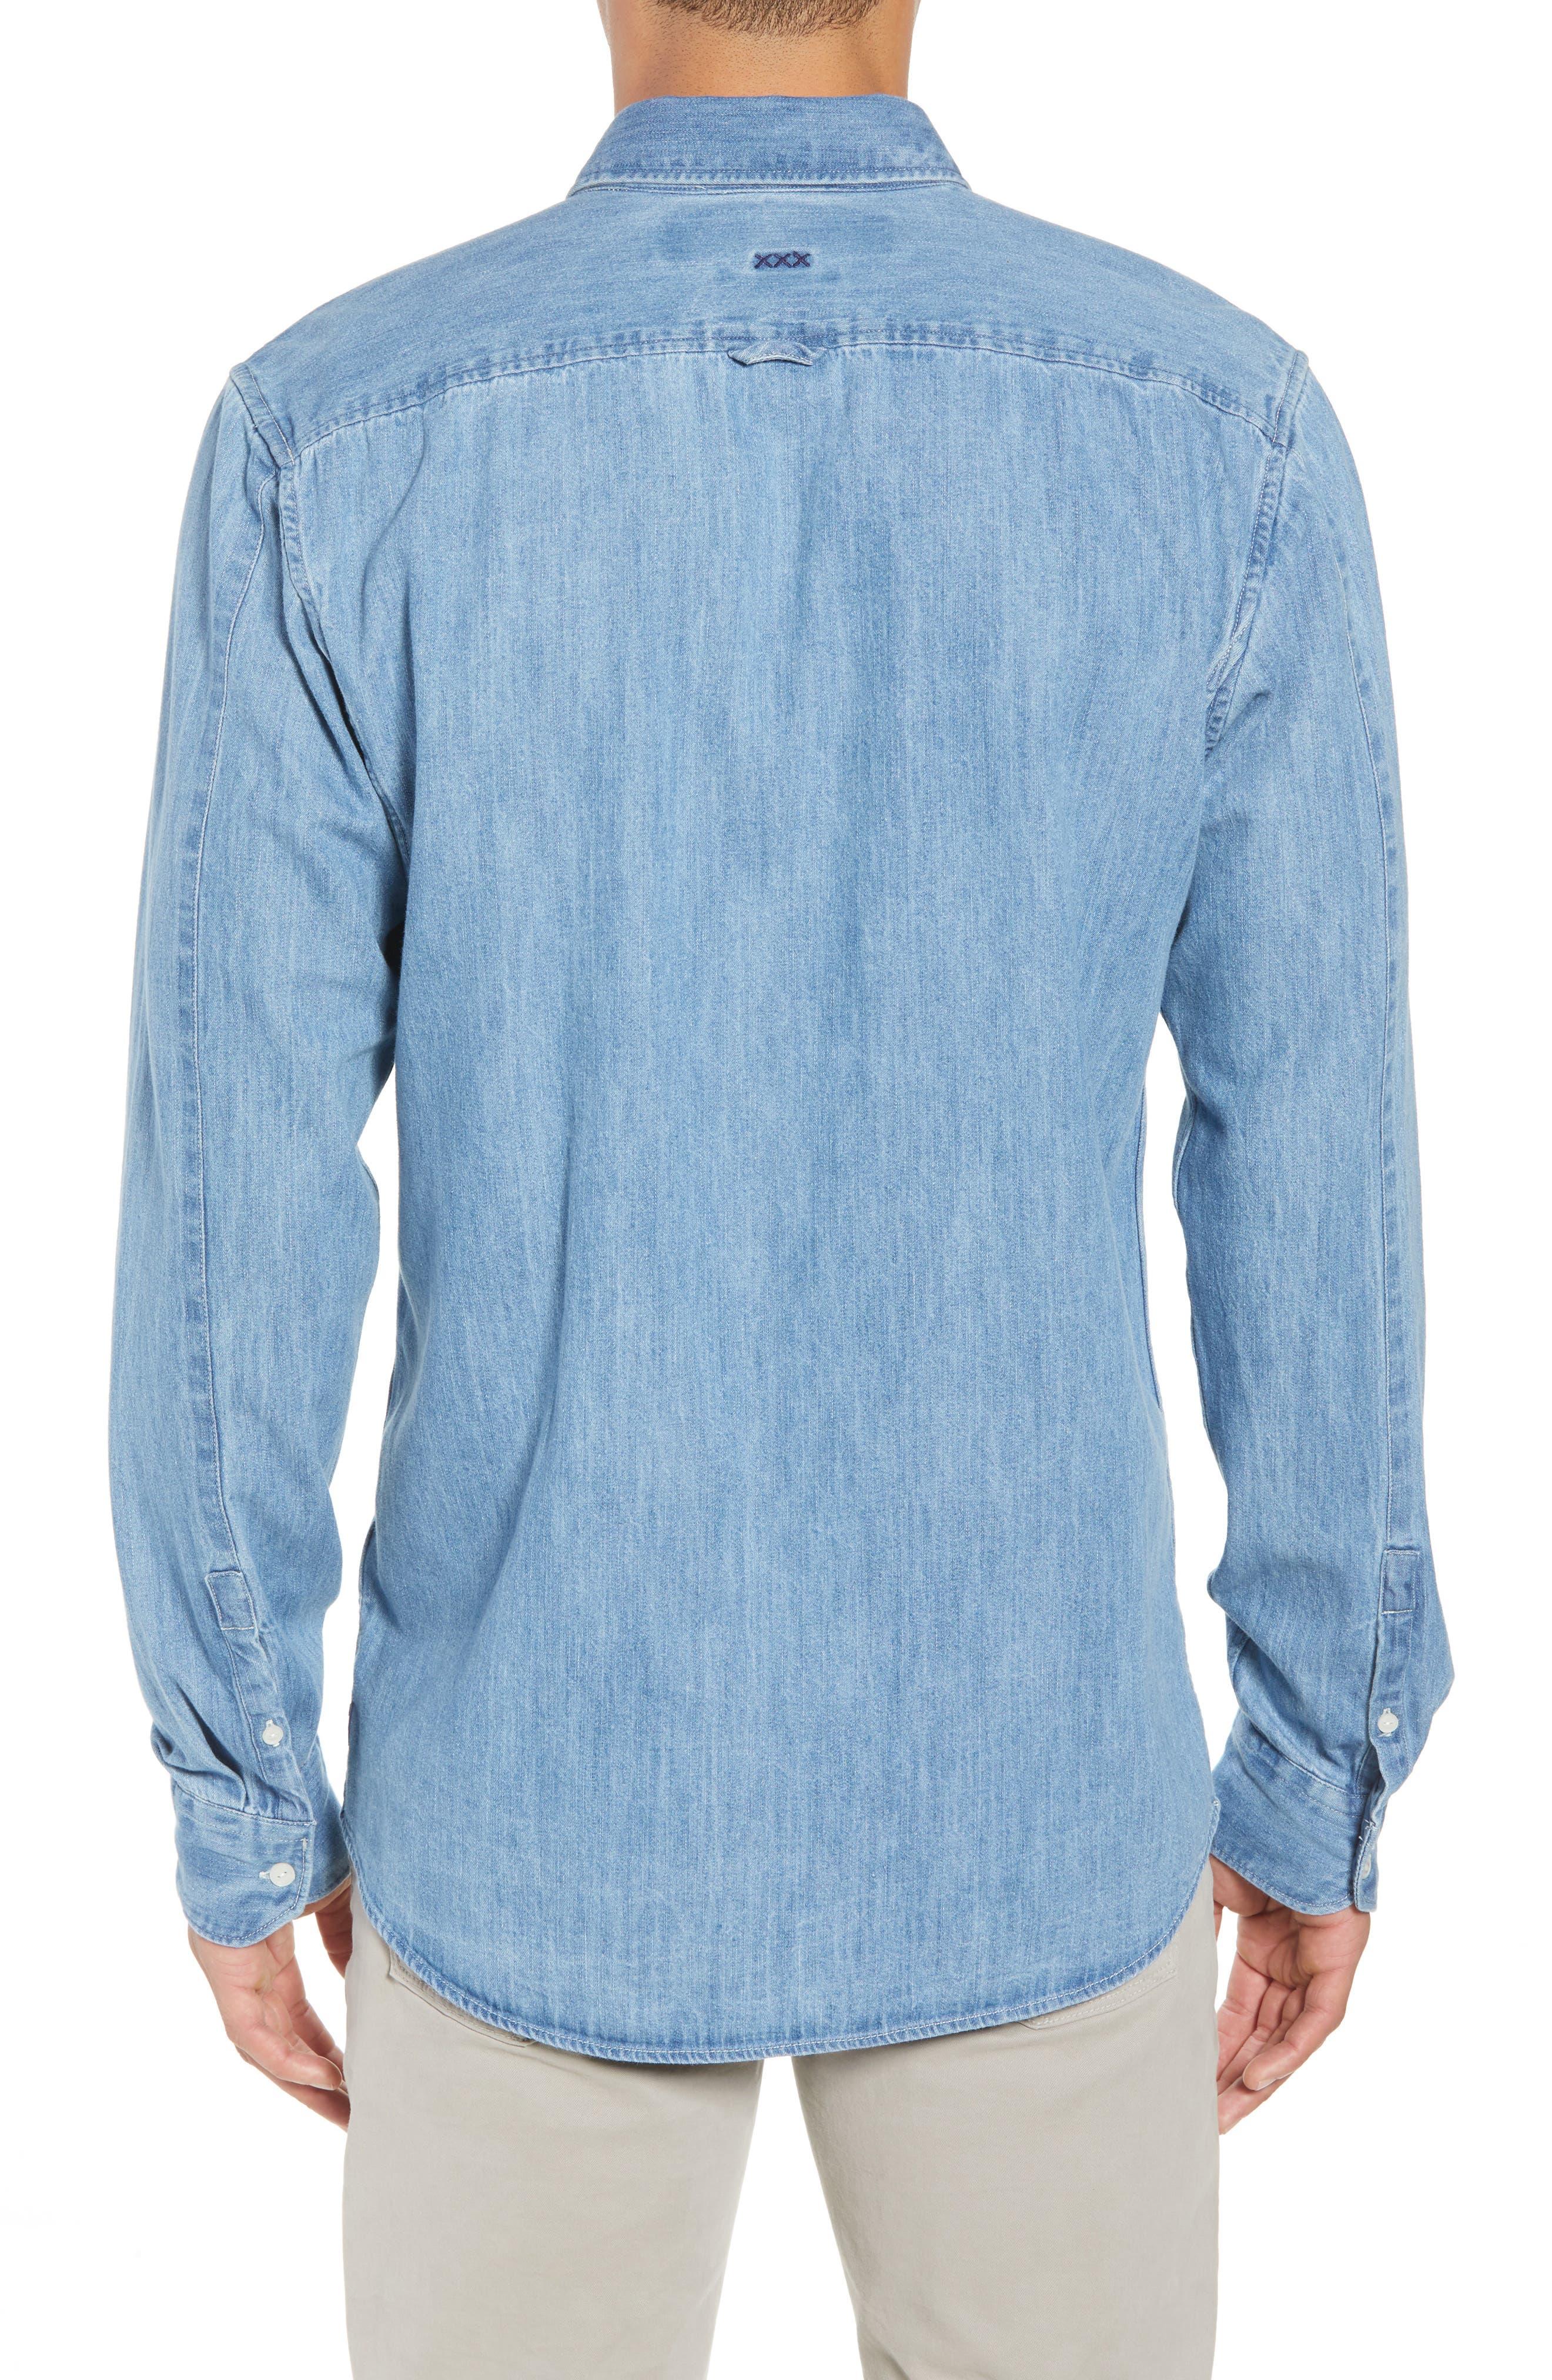 Amsterdams Blauw Pocket Square Chambray Sport Shirt,                             Alternate thumbnail 2, color,                             DENIM BLUE